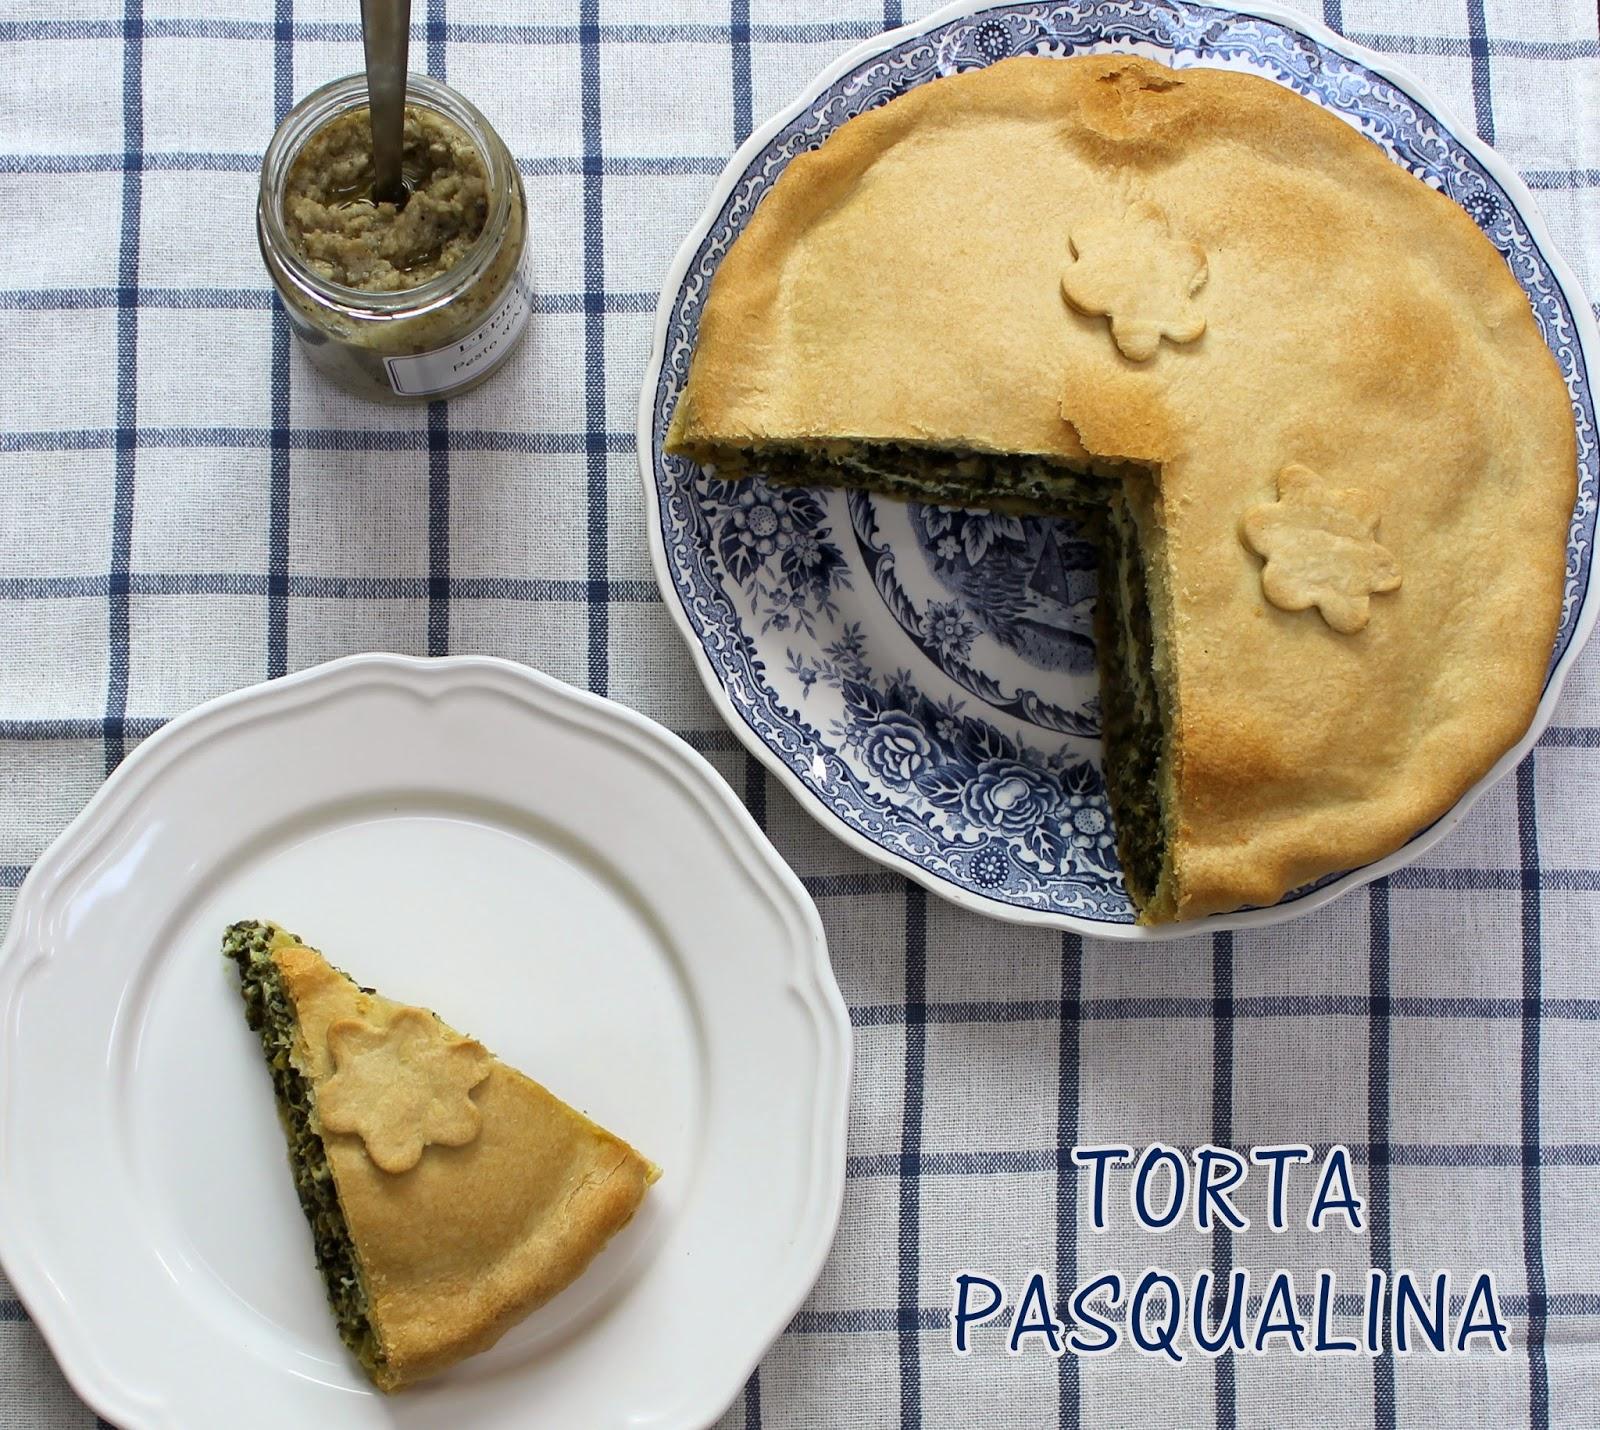 Torta pasqualina tourte pascale italienne revisit e blogs de cuisine - Blog de cuisine italienne ...